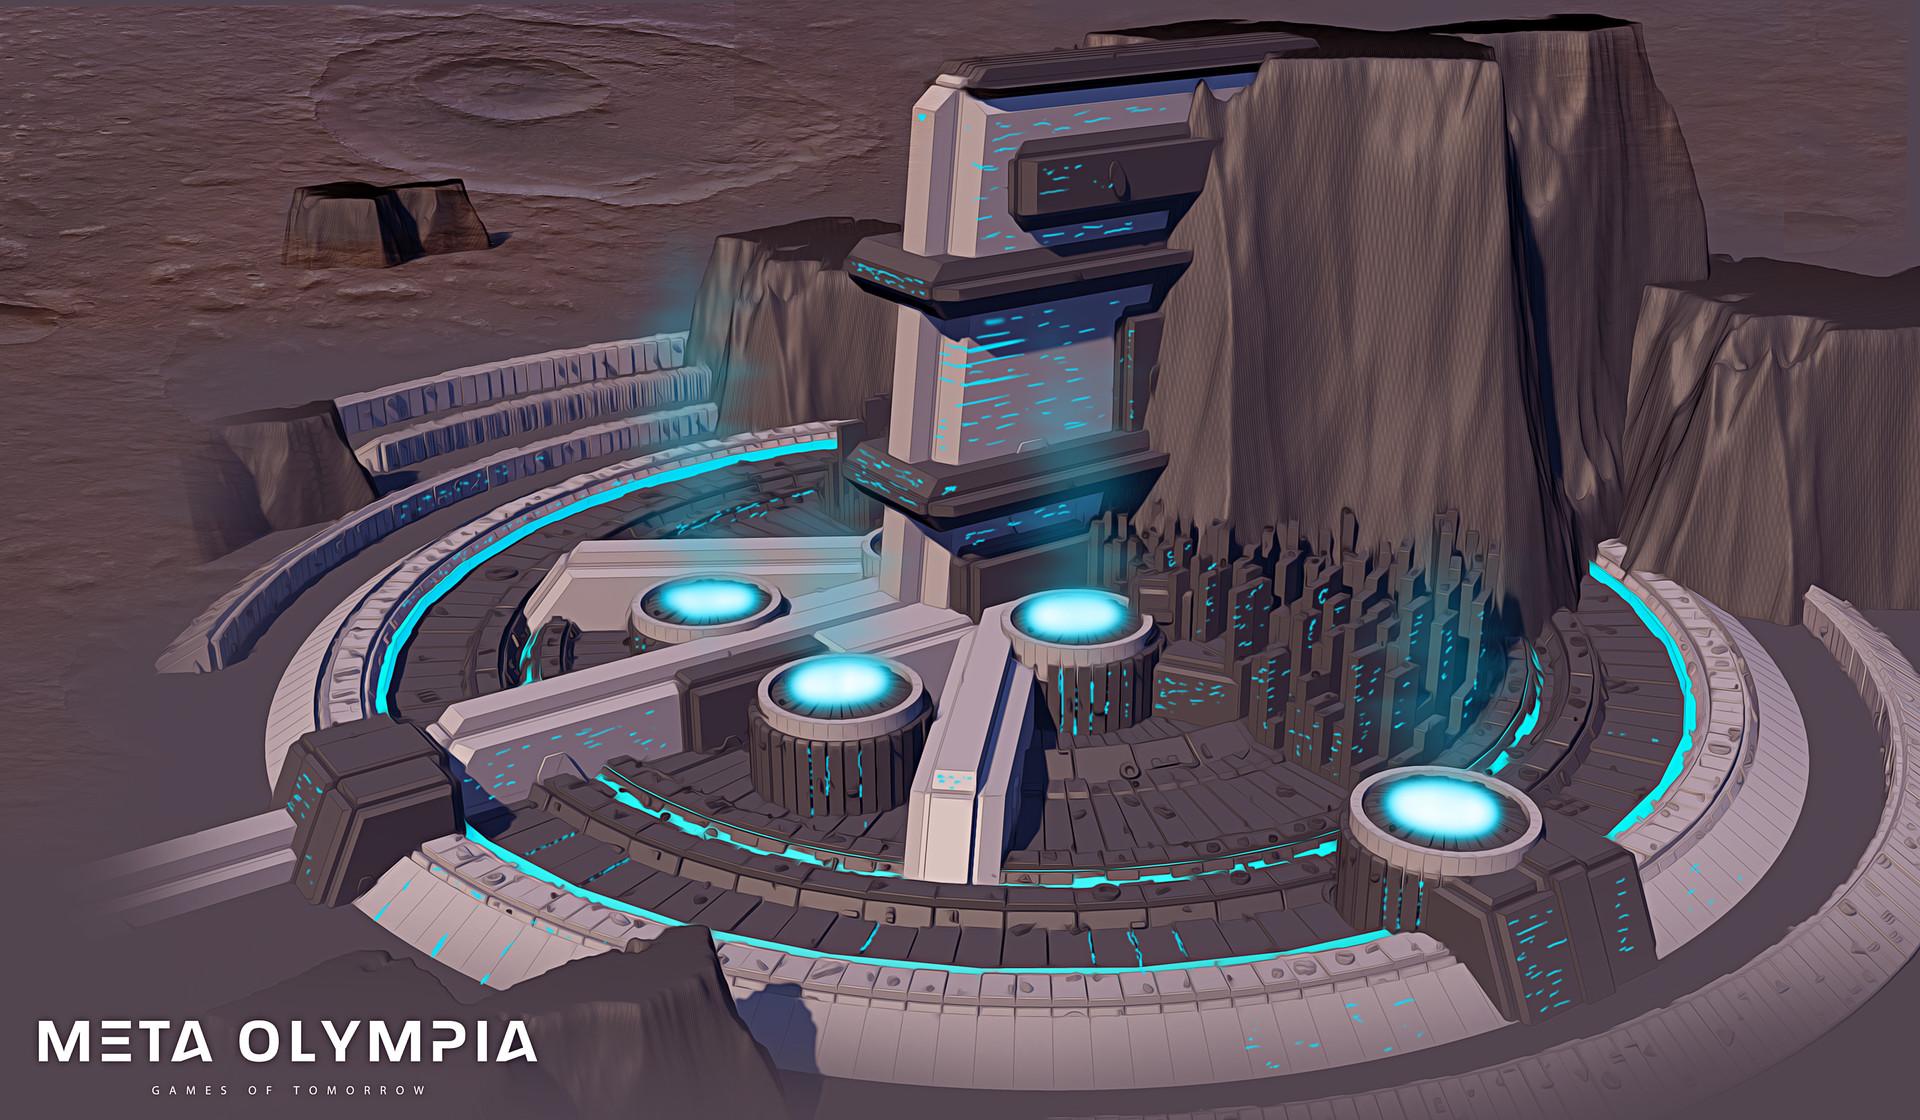 Meta olympia environment 3